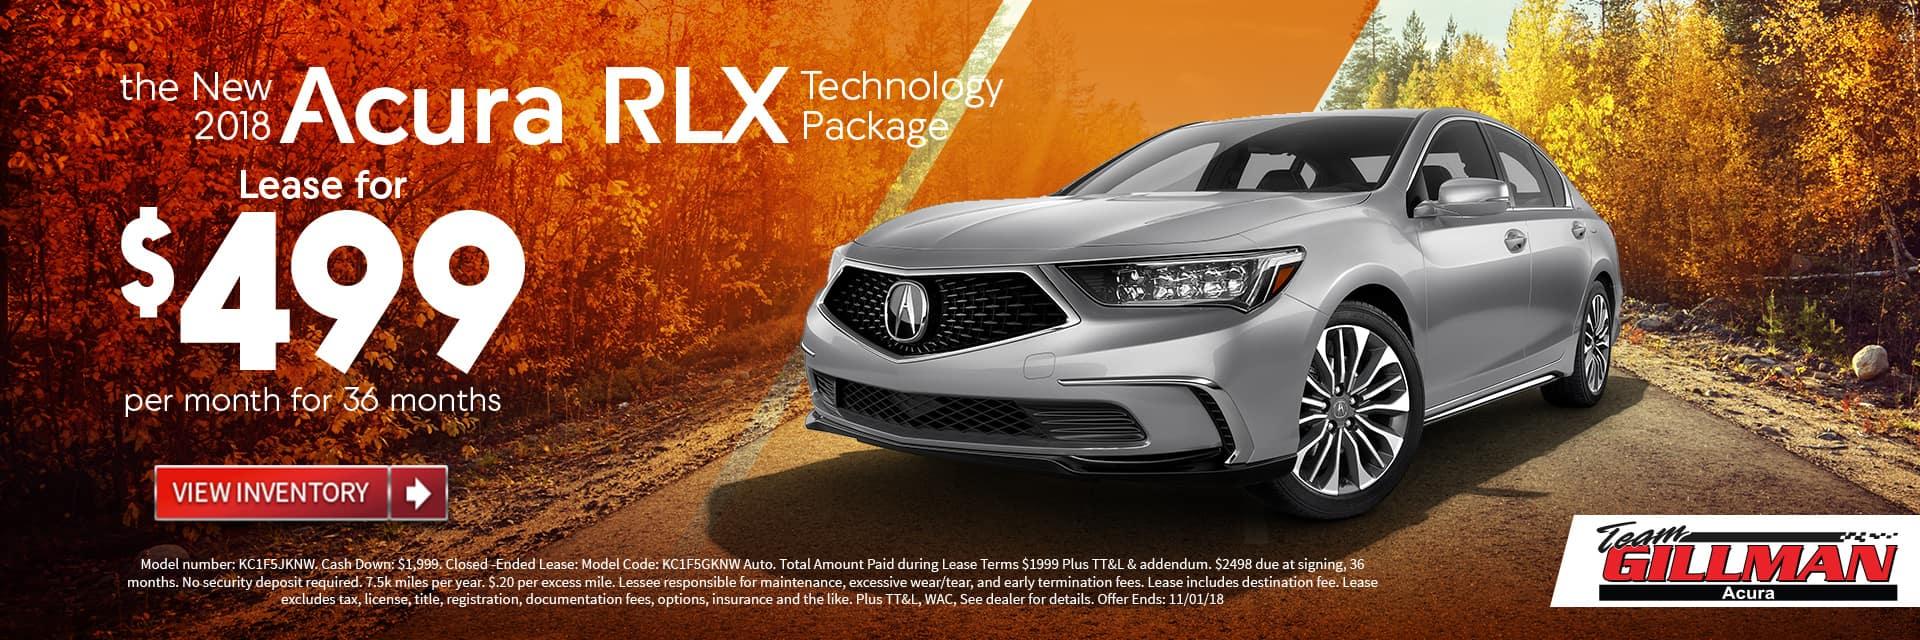 Gillman Acura New Acura Used Car Dealership In Houston TX - Acura parts dealer